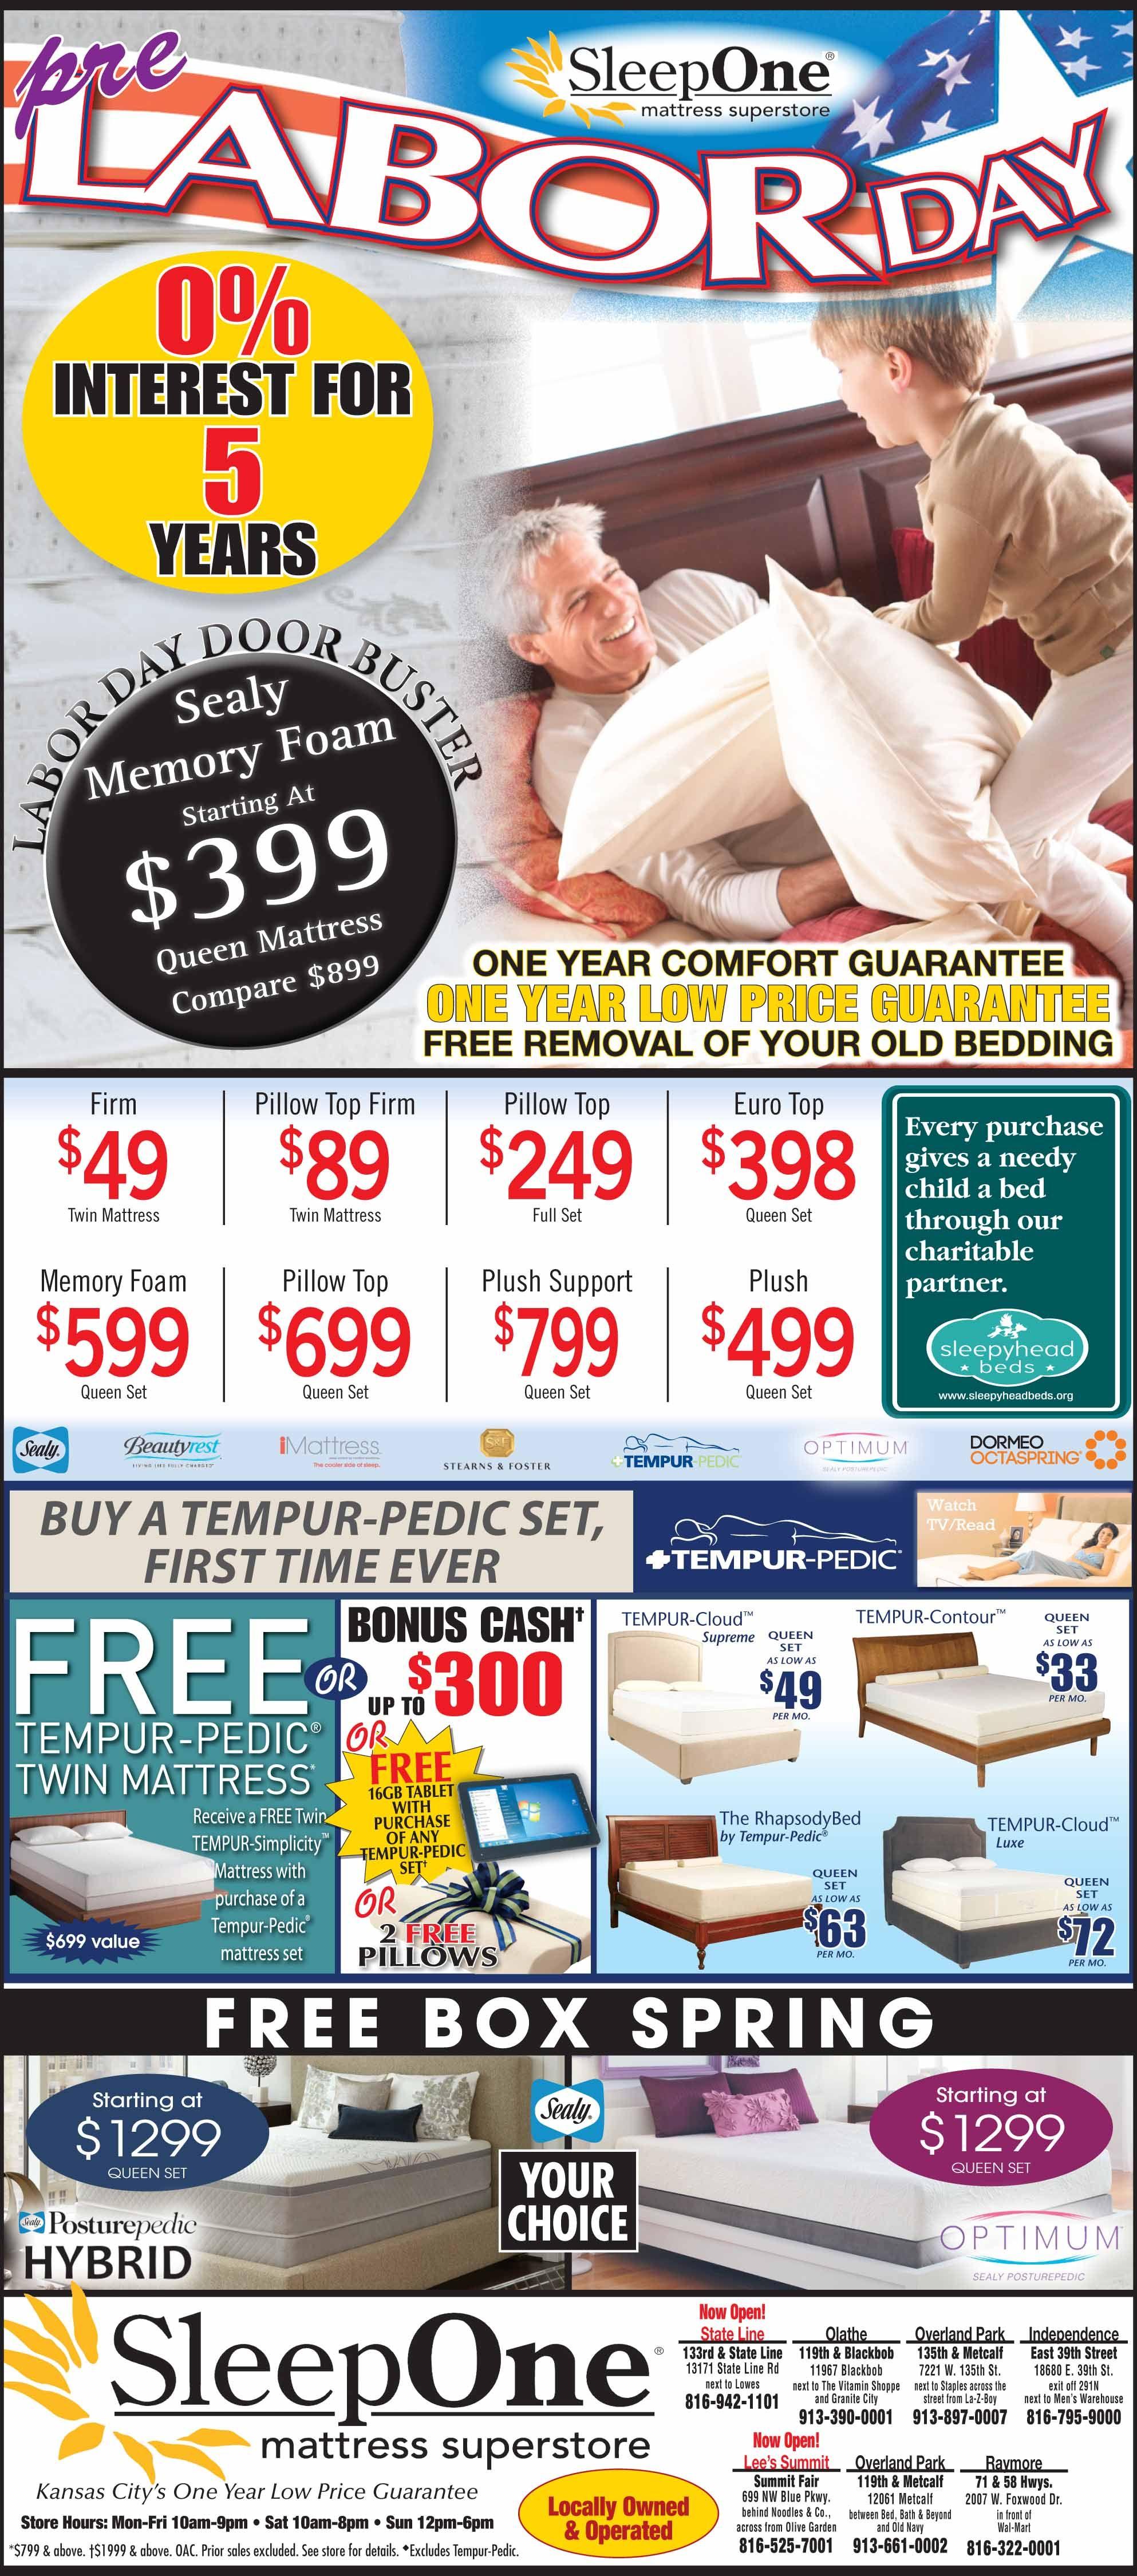 pre labor day offer at sleepone mattress superstore in kansas city